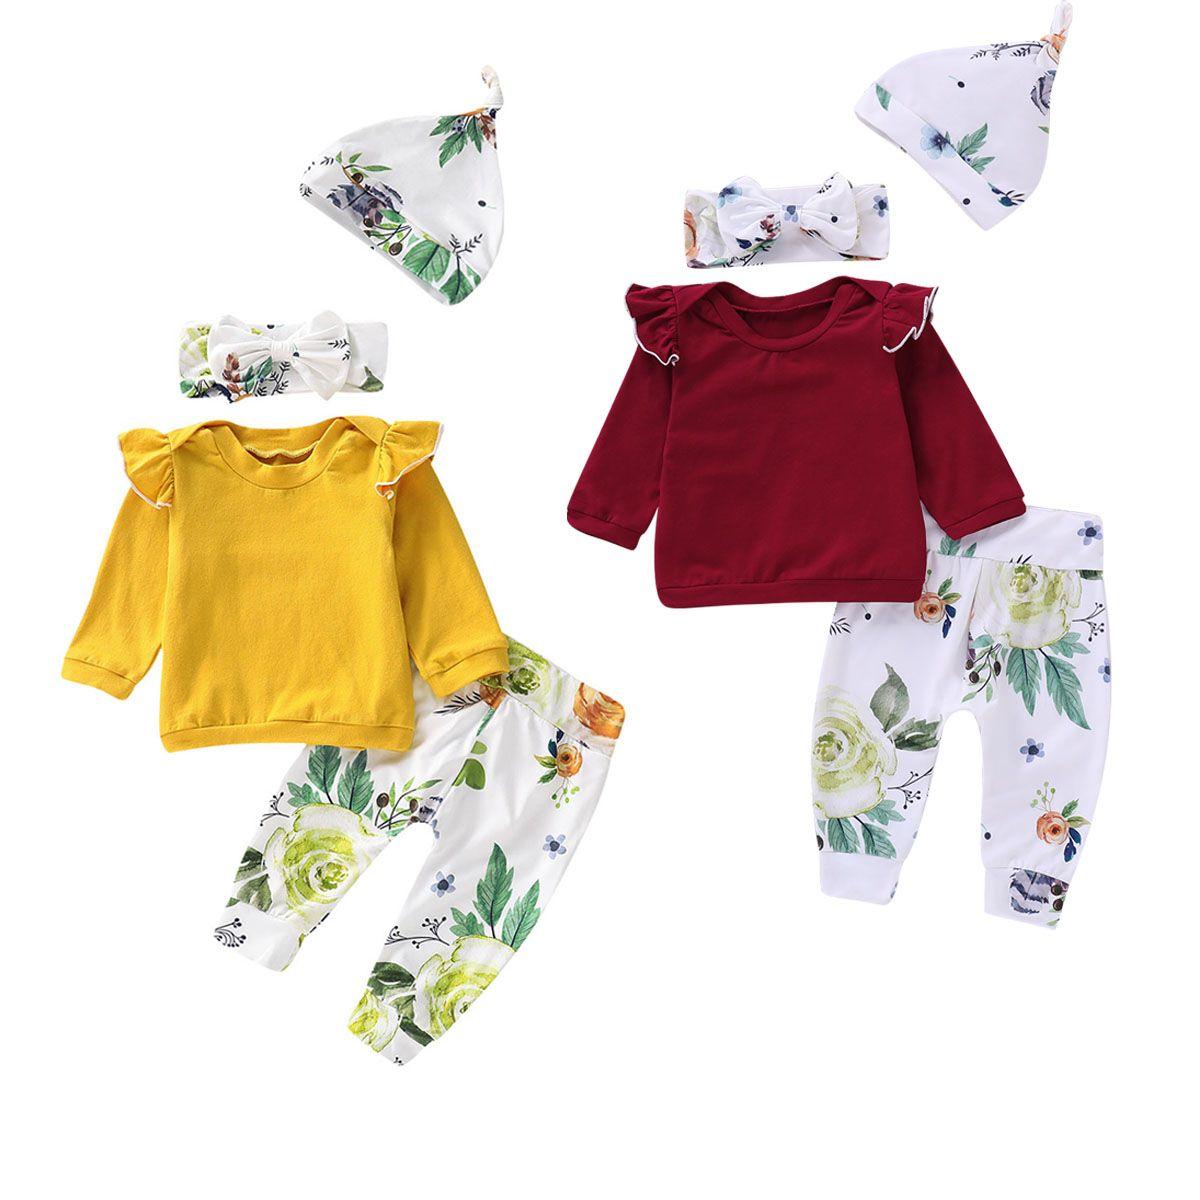 Mikrdoo Toddler Newborn Baby Girls New Arrival Clothes Set Long Sleeve Ruffle Top Floral Print Pant Hat Headband 4PCS Sprint Autumn Outfit